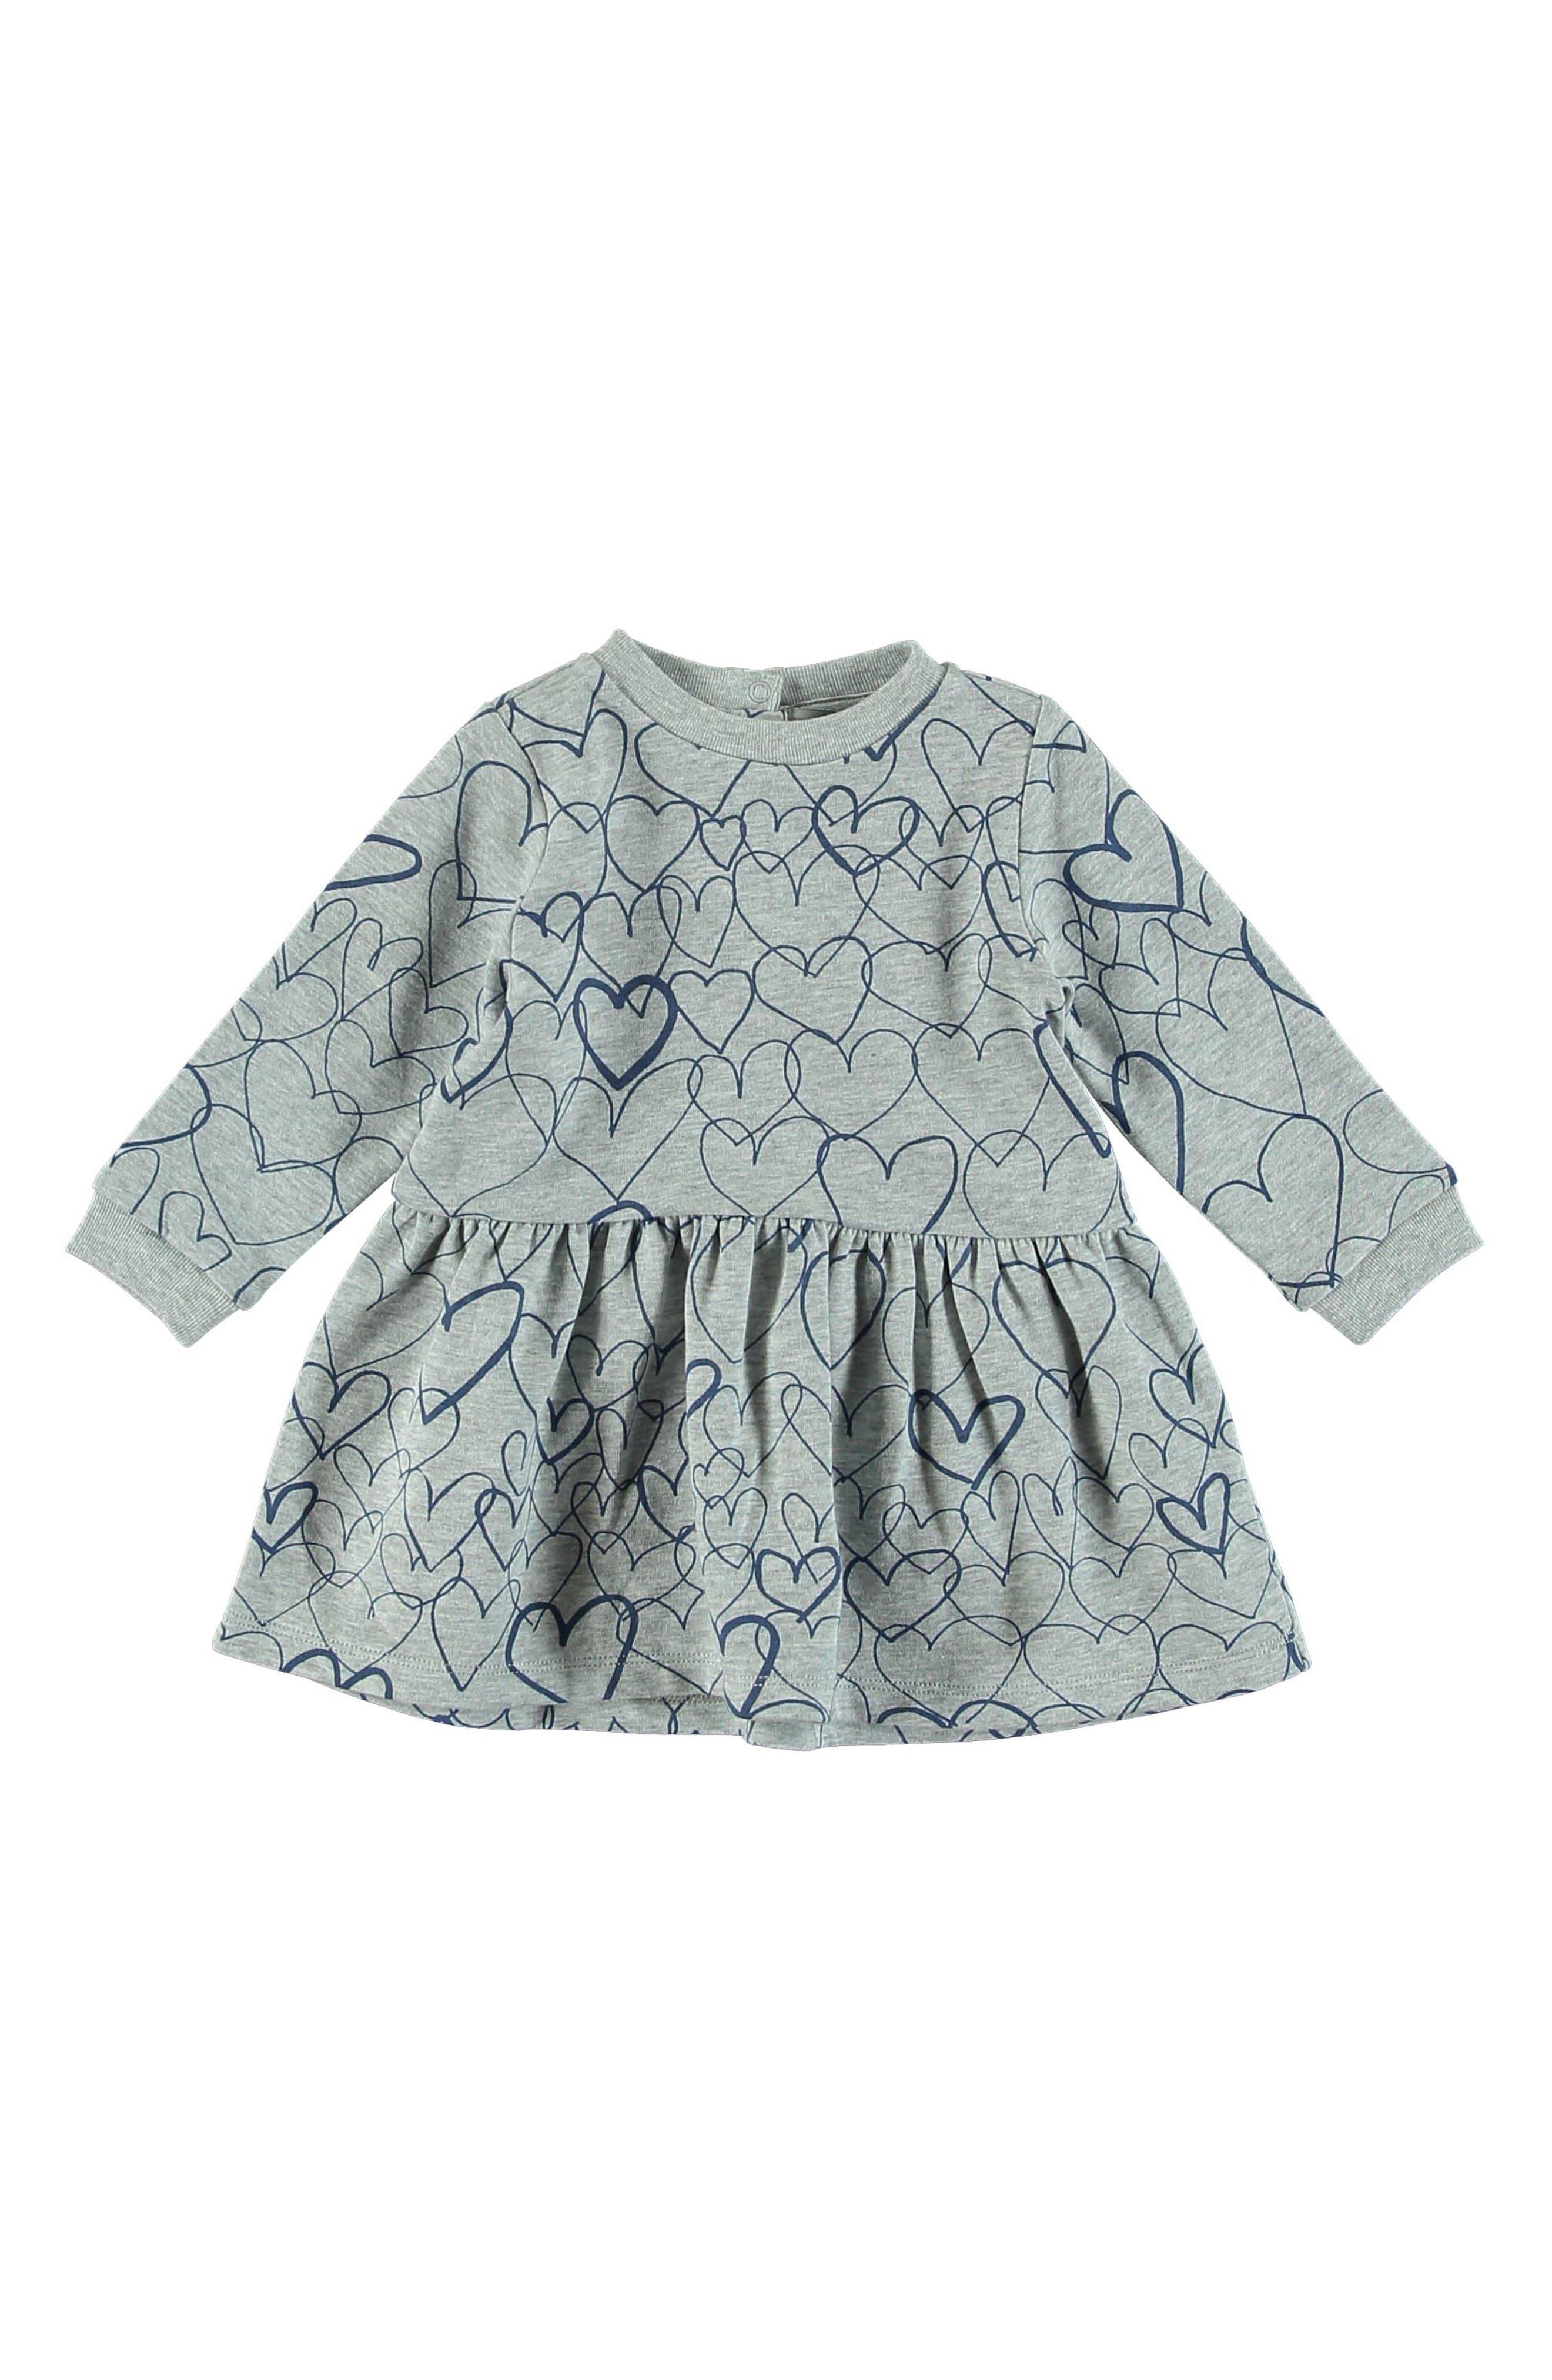 Bretta Heart Print Dress,                             Main thumbnail 1, color,                             GREY BLUE